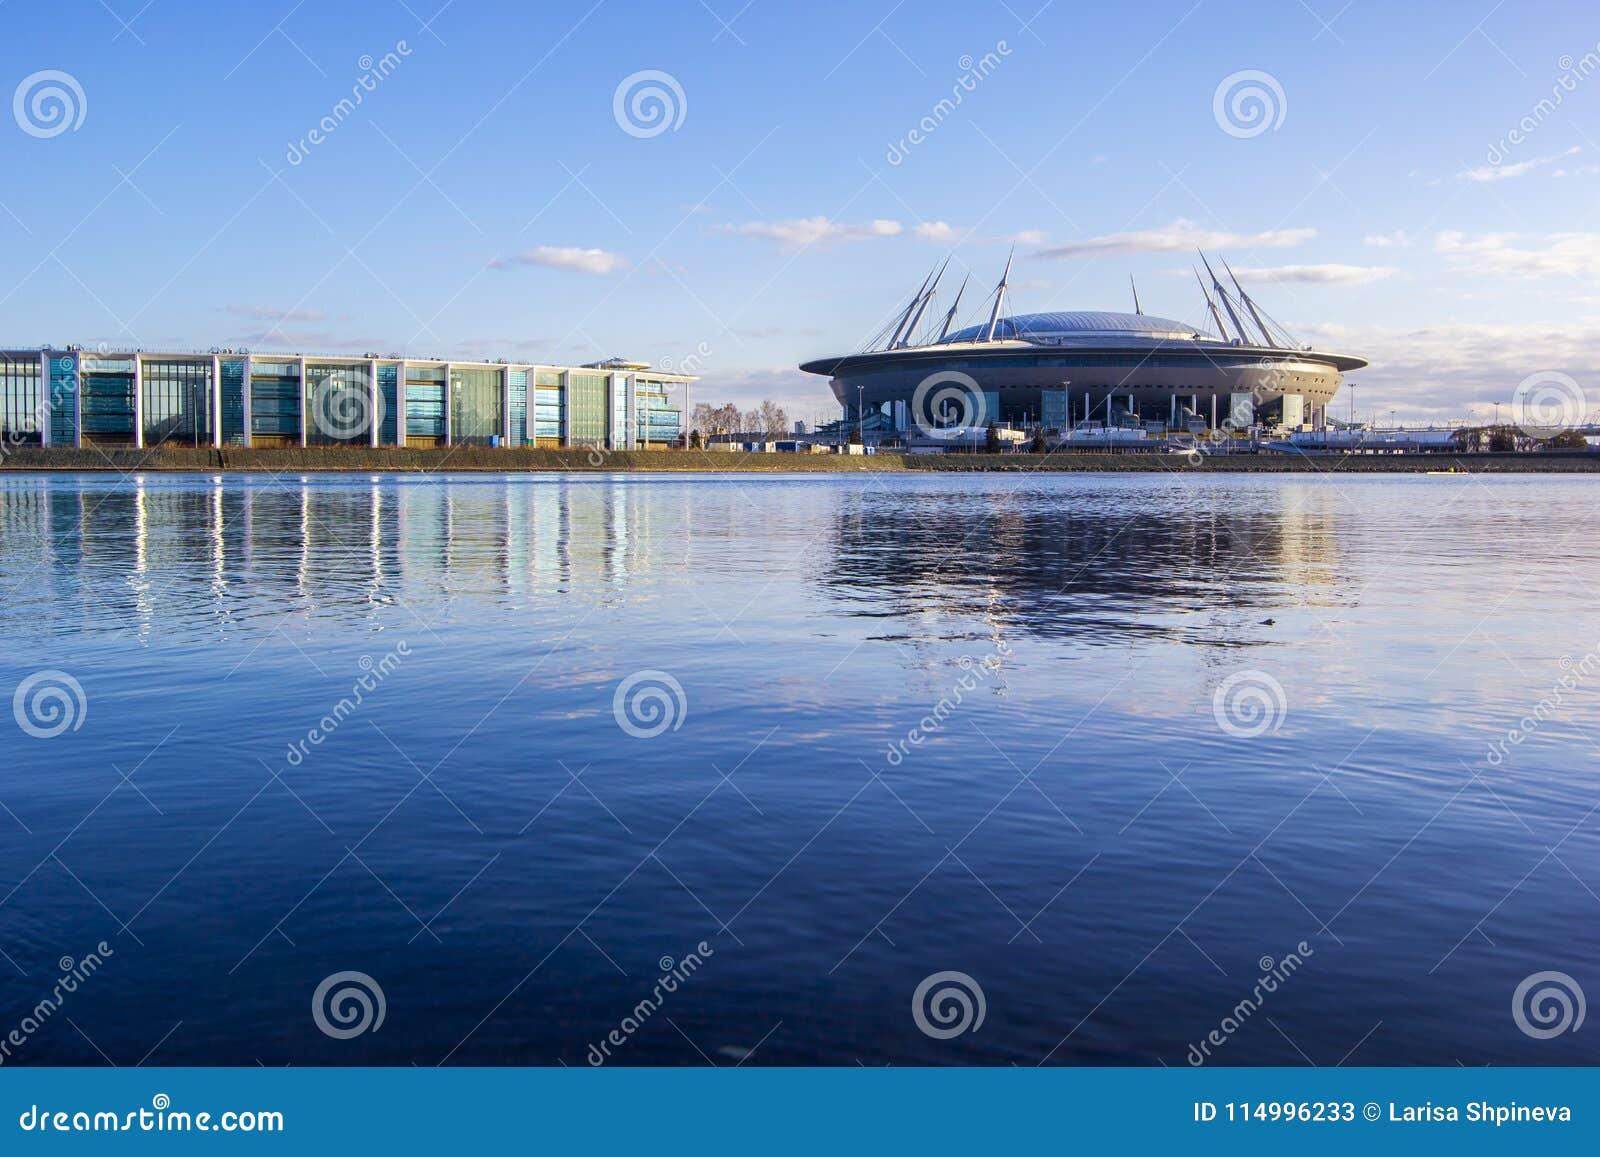 e6426a1c92cb Stadium On Krestovsky Island